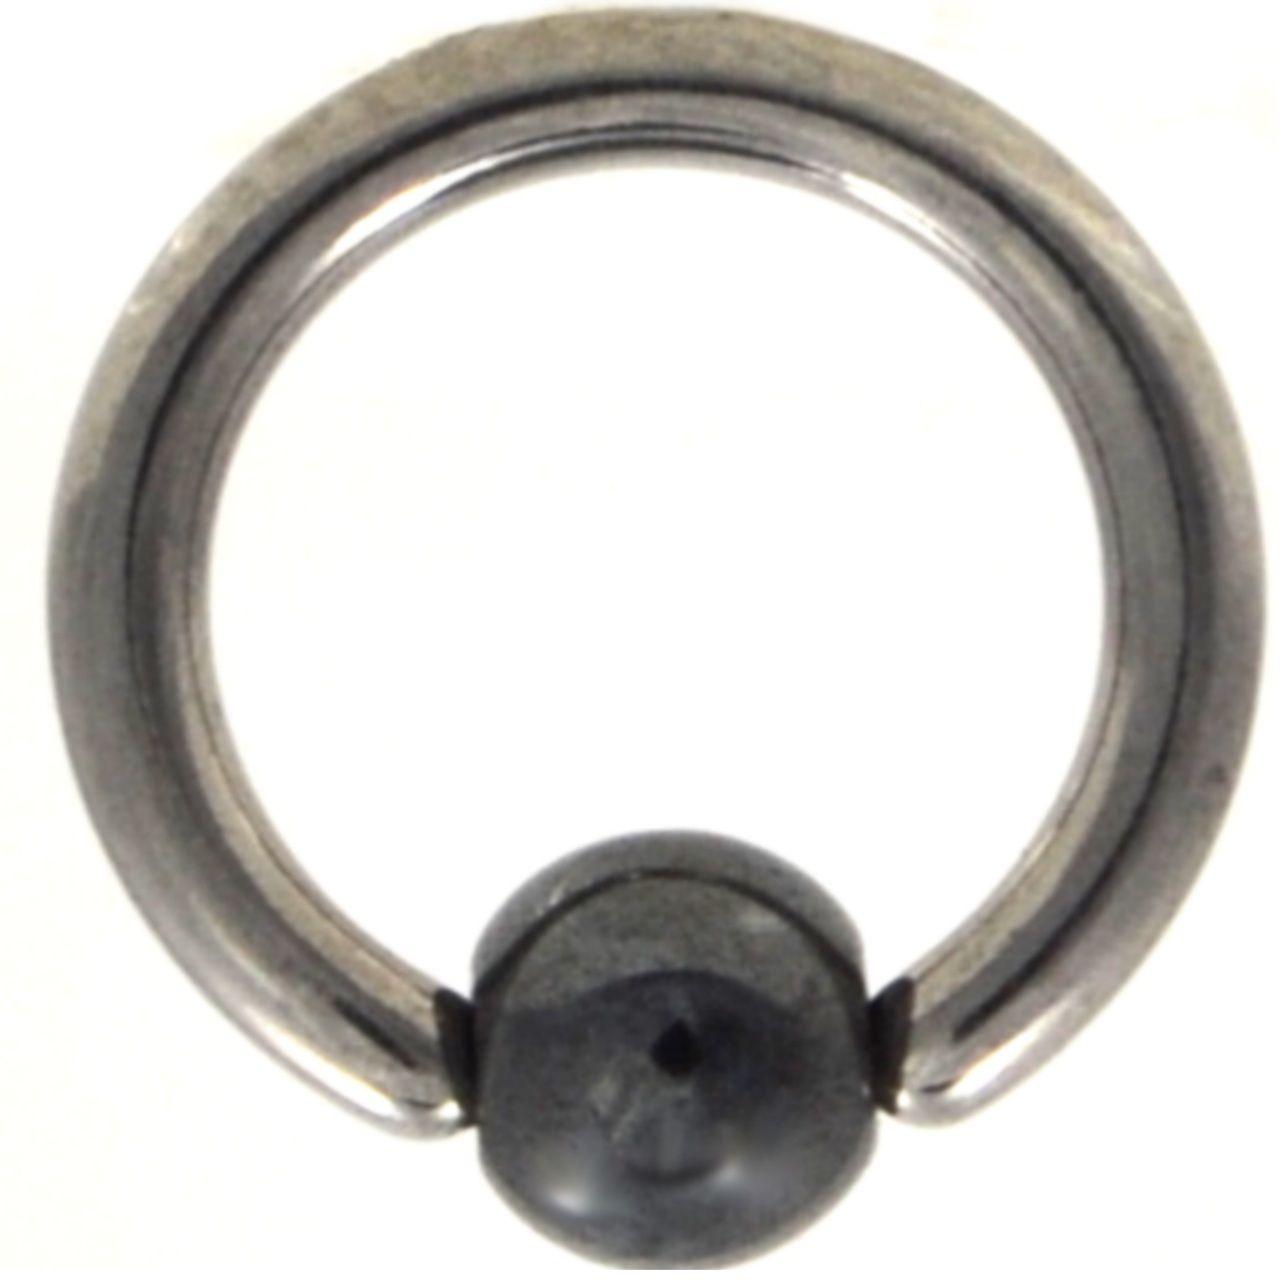 BodyDazz.com - PAIR - Hematite Ball Captive Bead Ring CBR (Available in 18G/16G/14G)